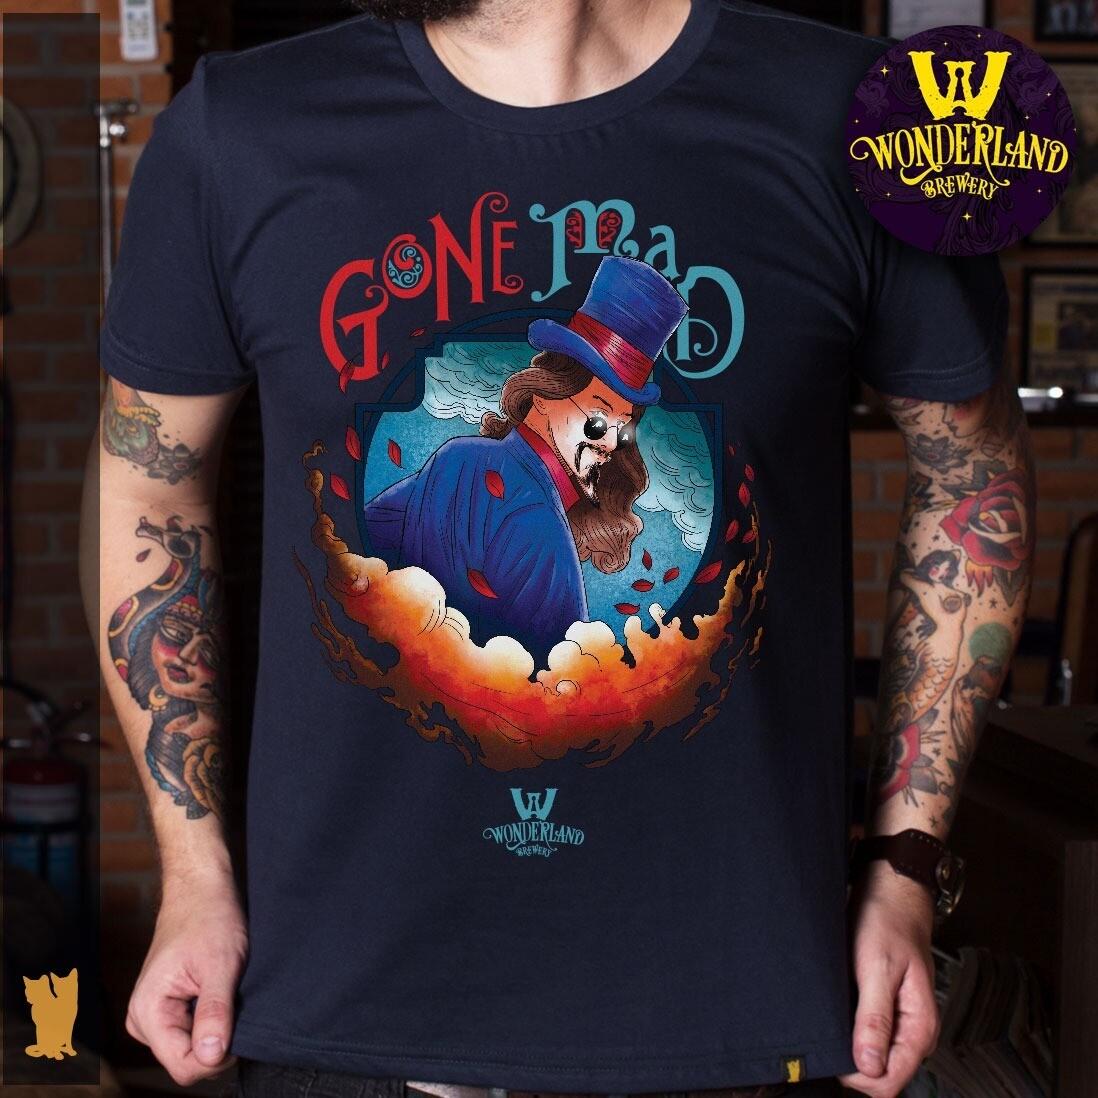 Camisa masculina - Gone Mad